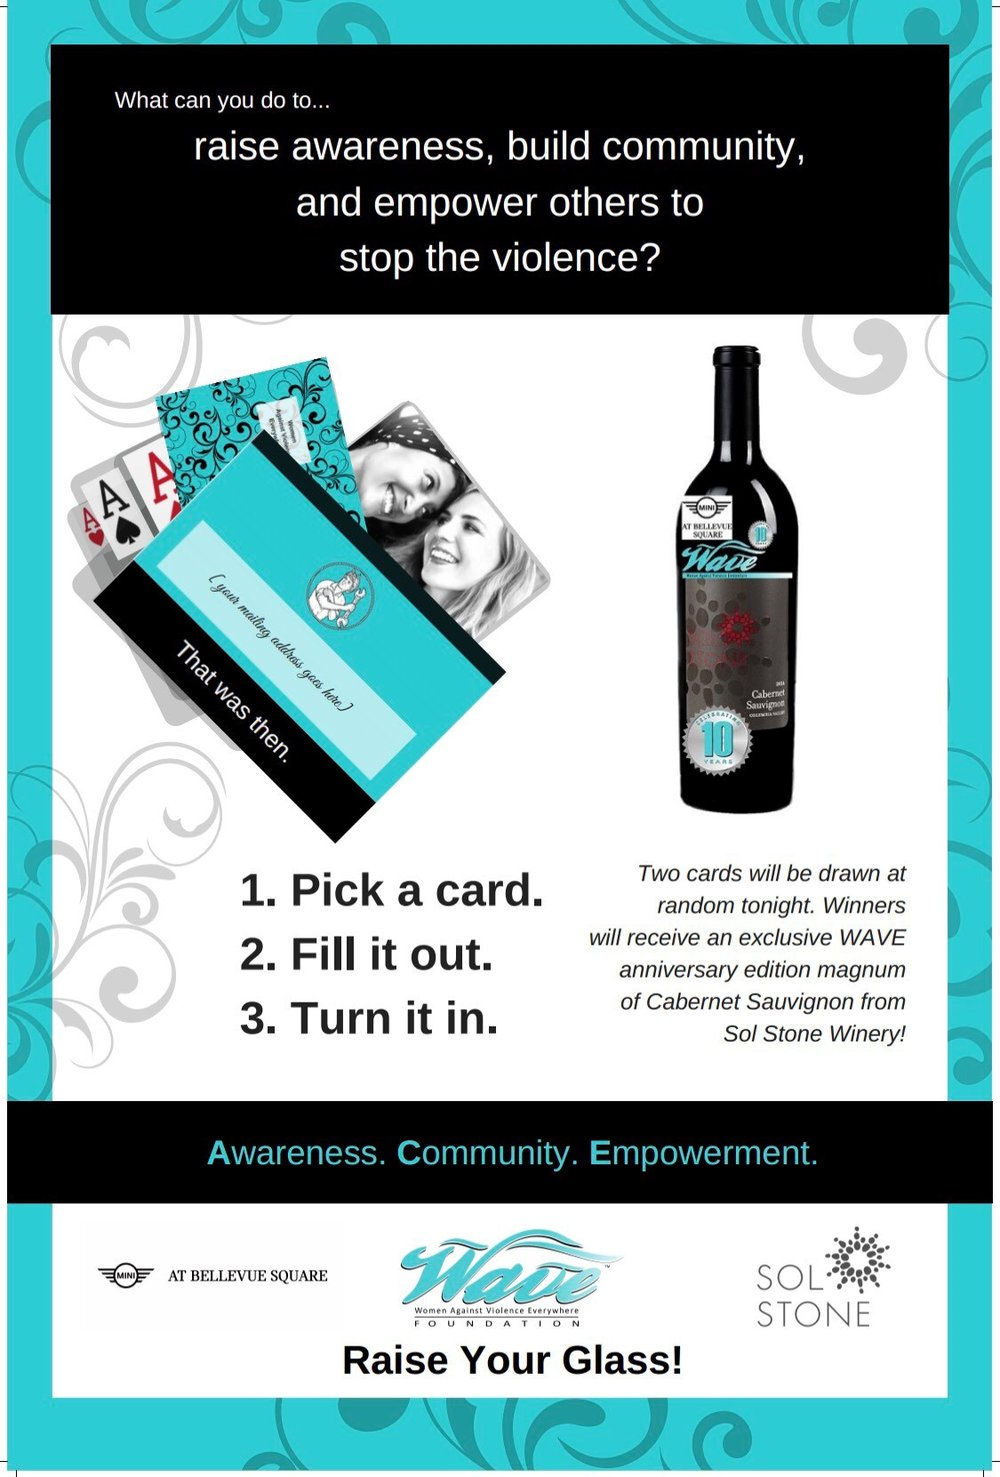 WAVE_RYG engagement activity poster.jpg